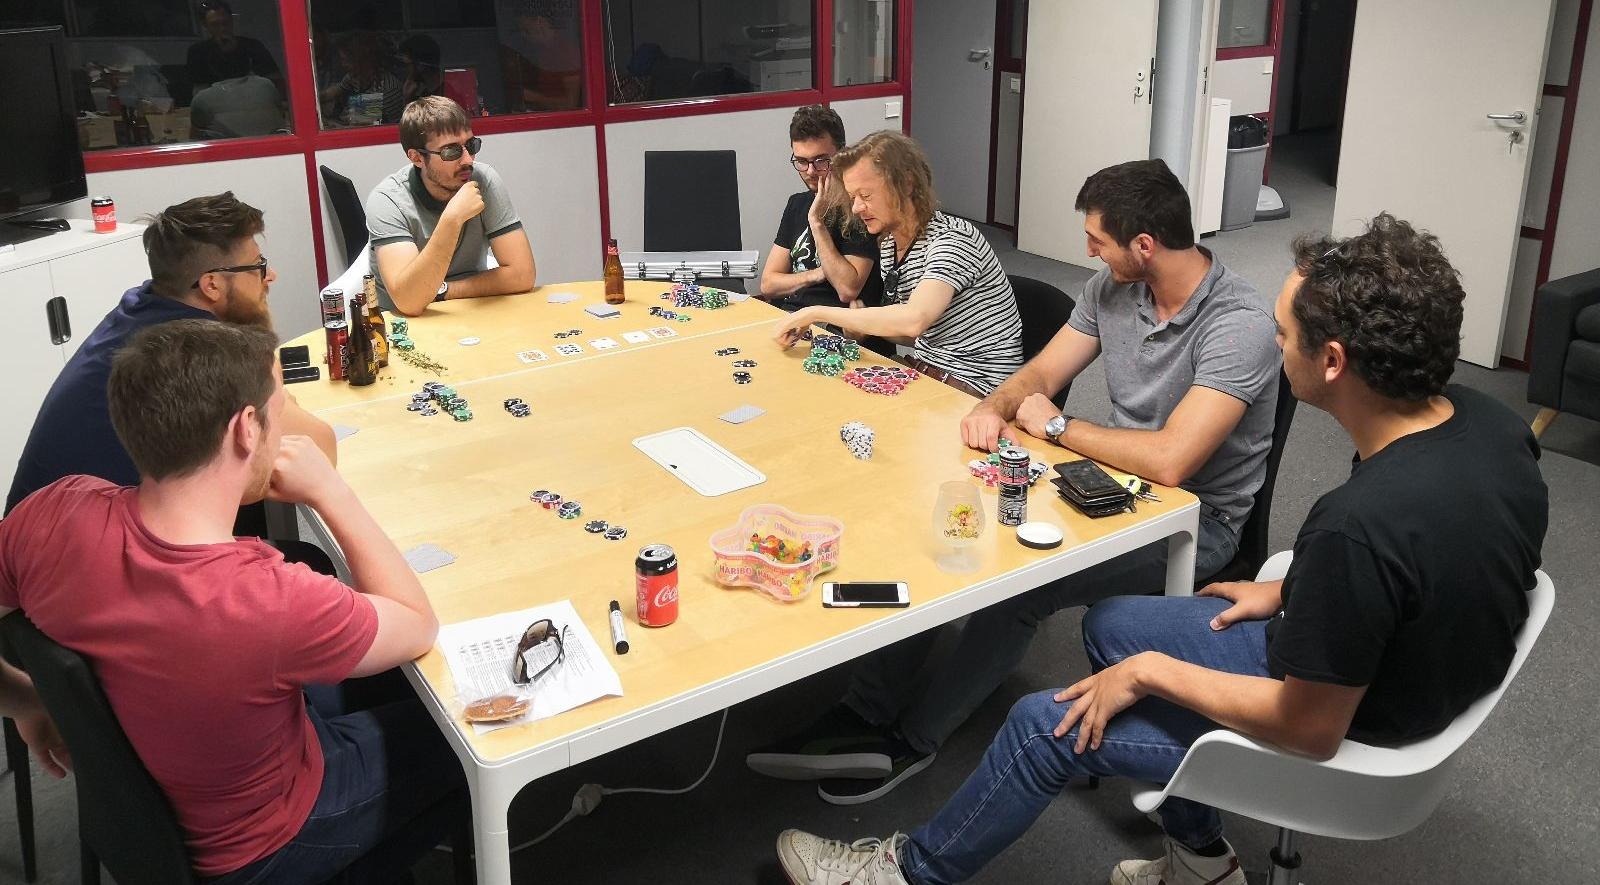 Poker WhiteDev